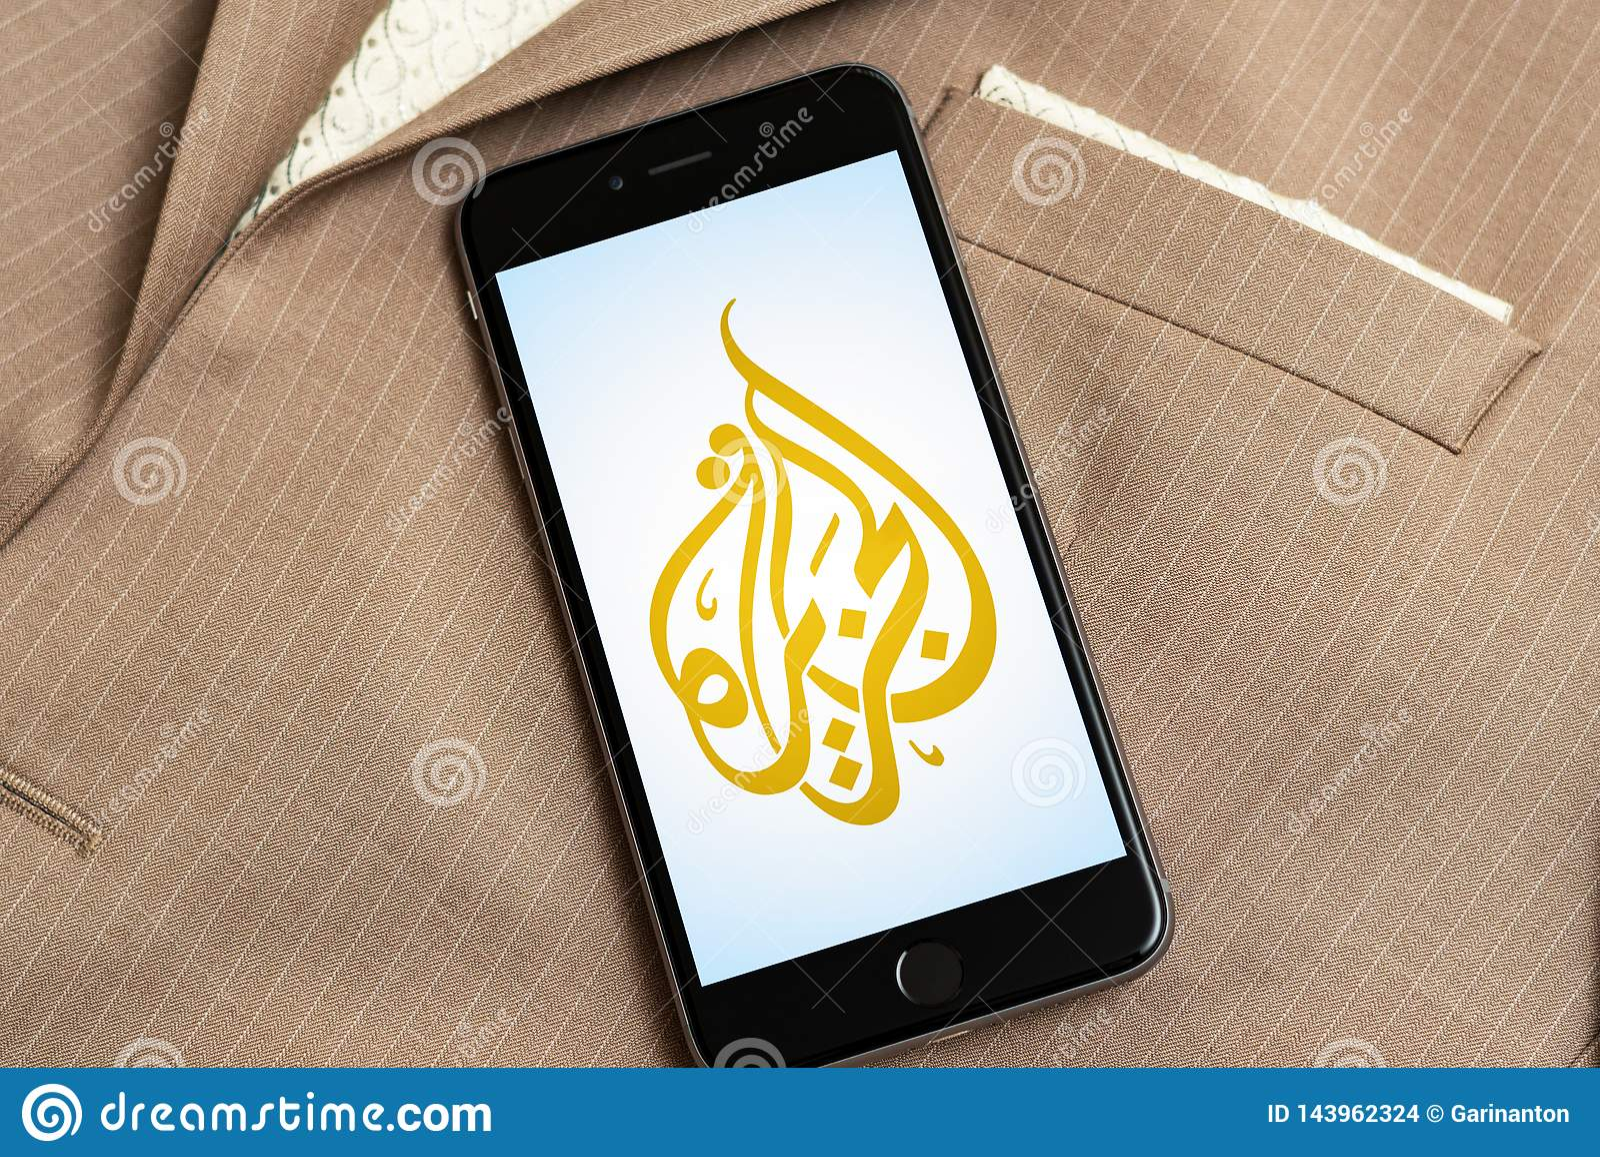 Black Phone With Logo Of News Media Al Jazeera On The Screen